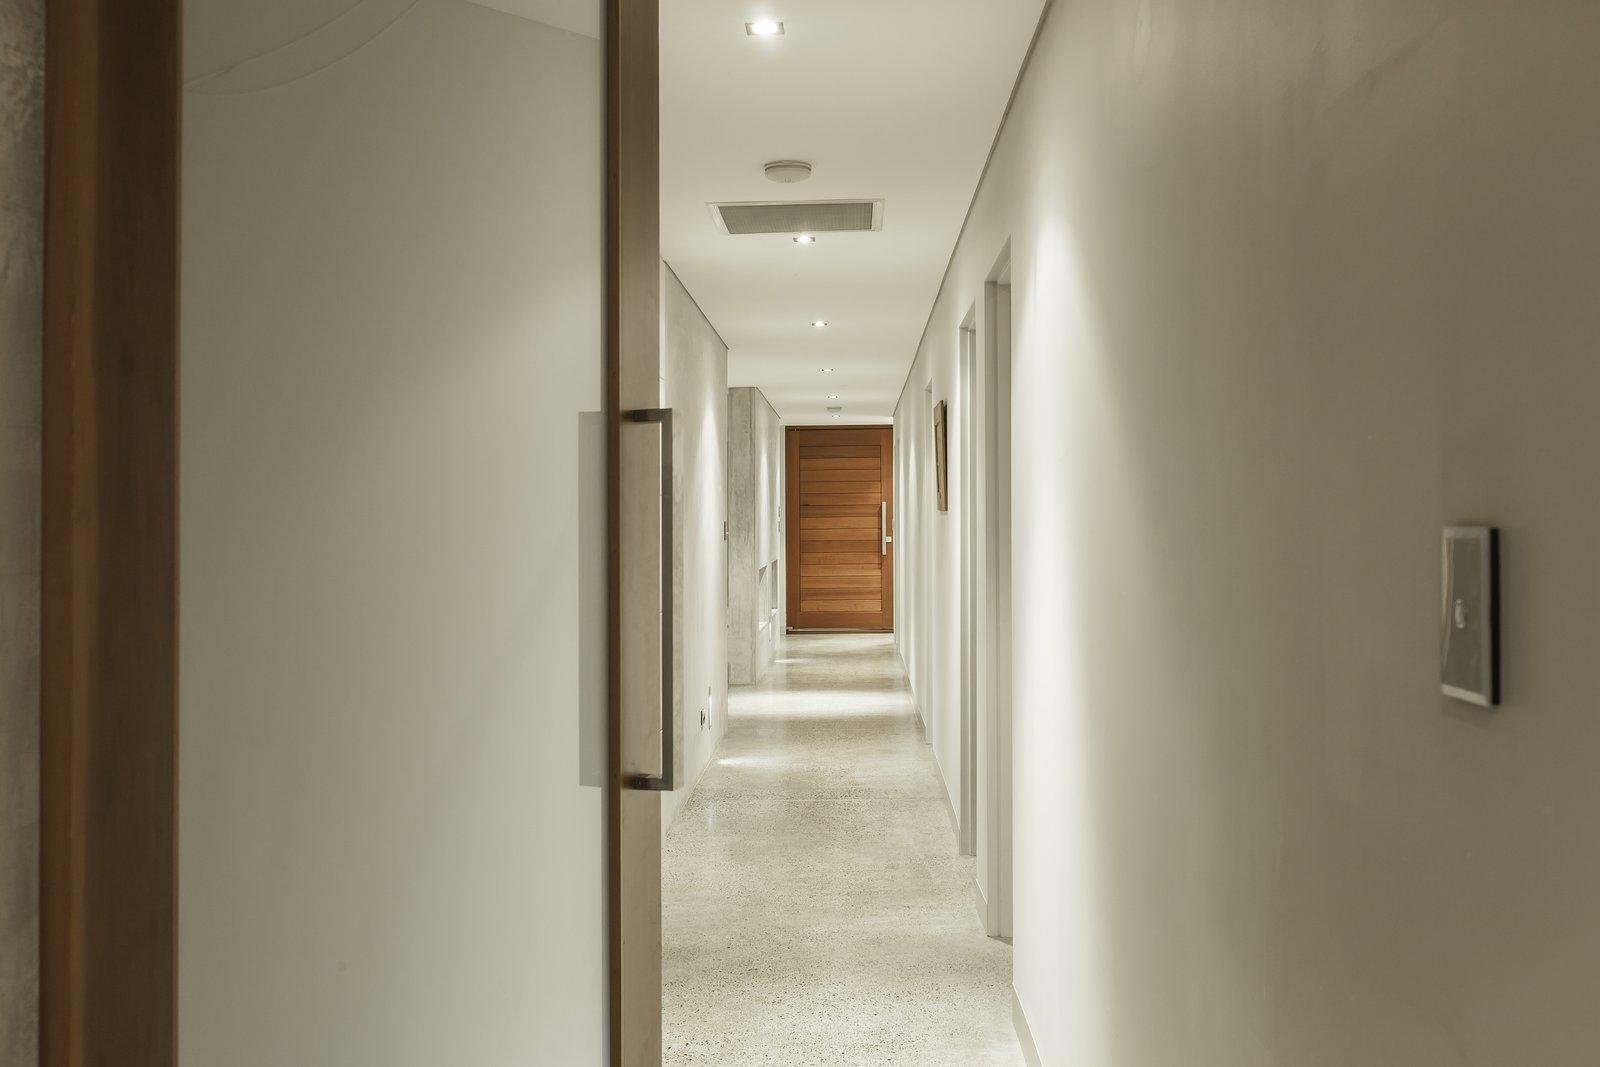 Living Room, Concrete Floor, Ceiling Lighting, and Wall Lighting The Glide zone - mishacks' modular design system.  01 White Shack. by mishack.